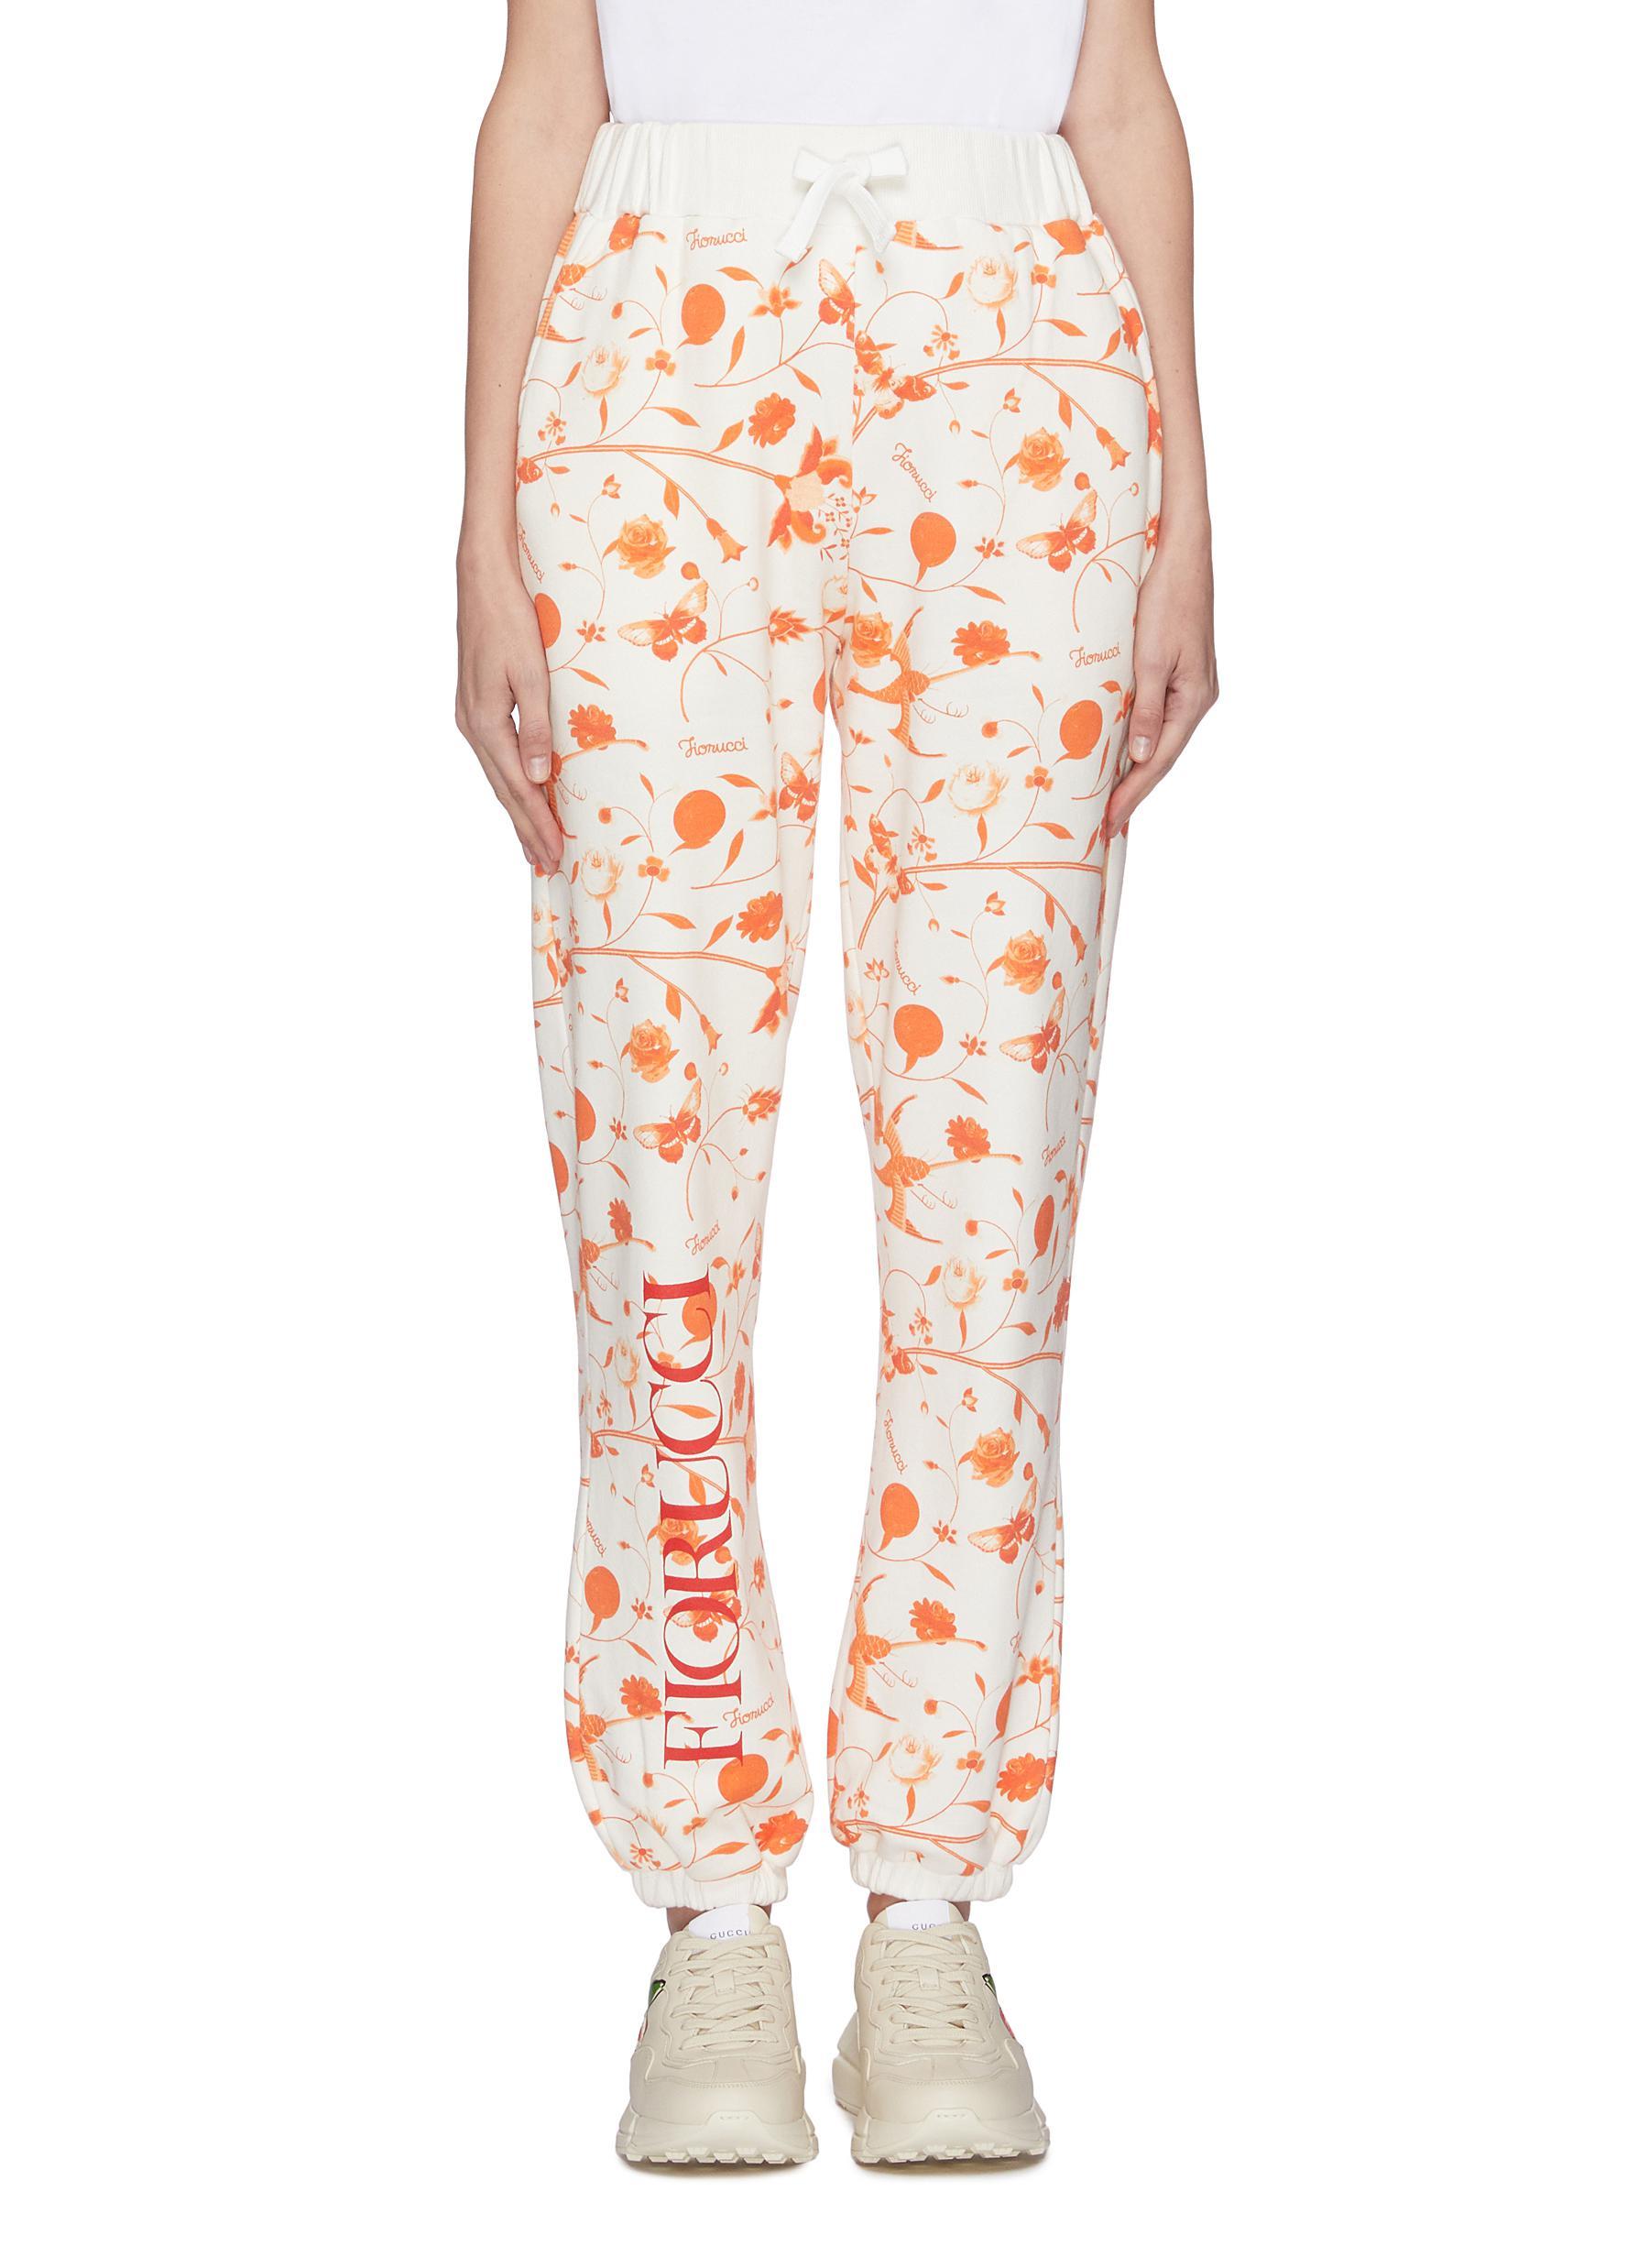 Buy Fiorucci Pants & Shorts Floral print jogging pants